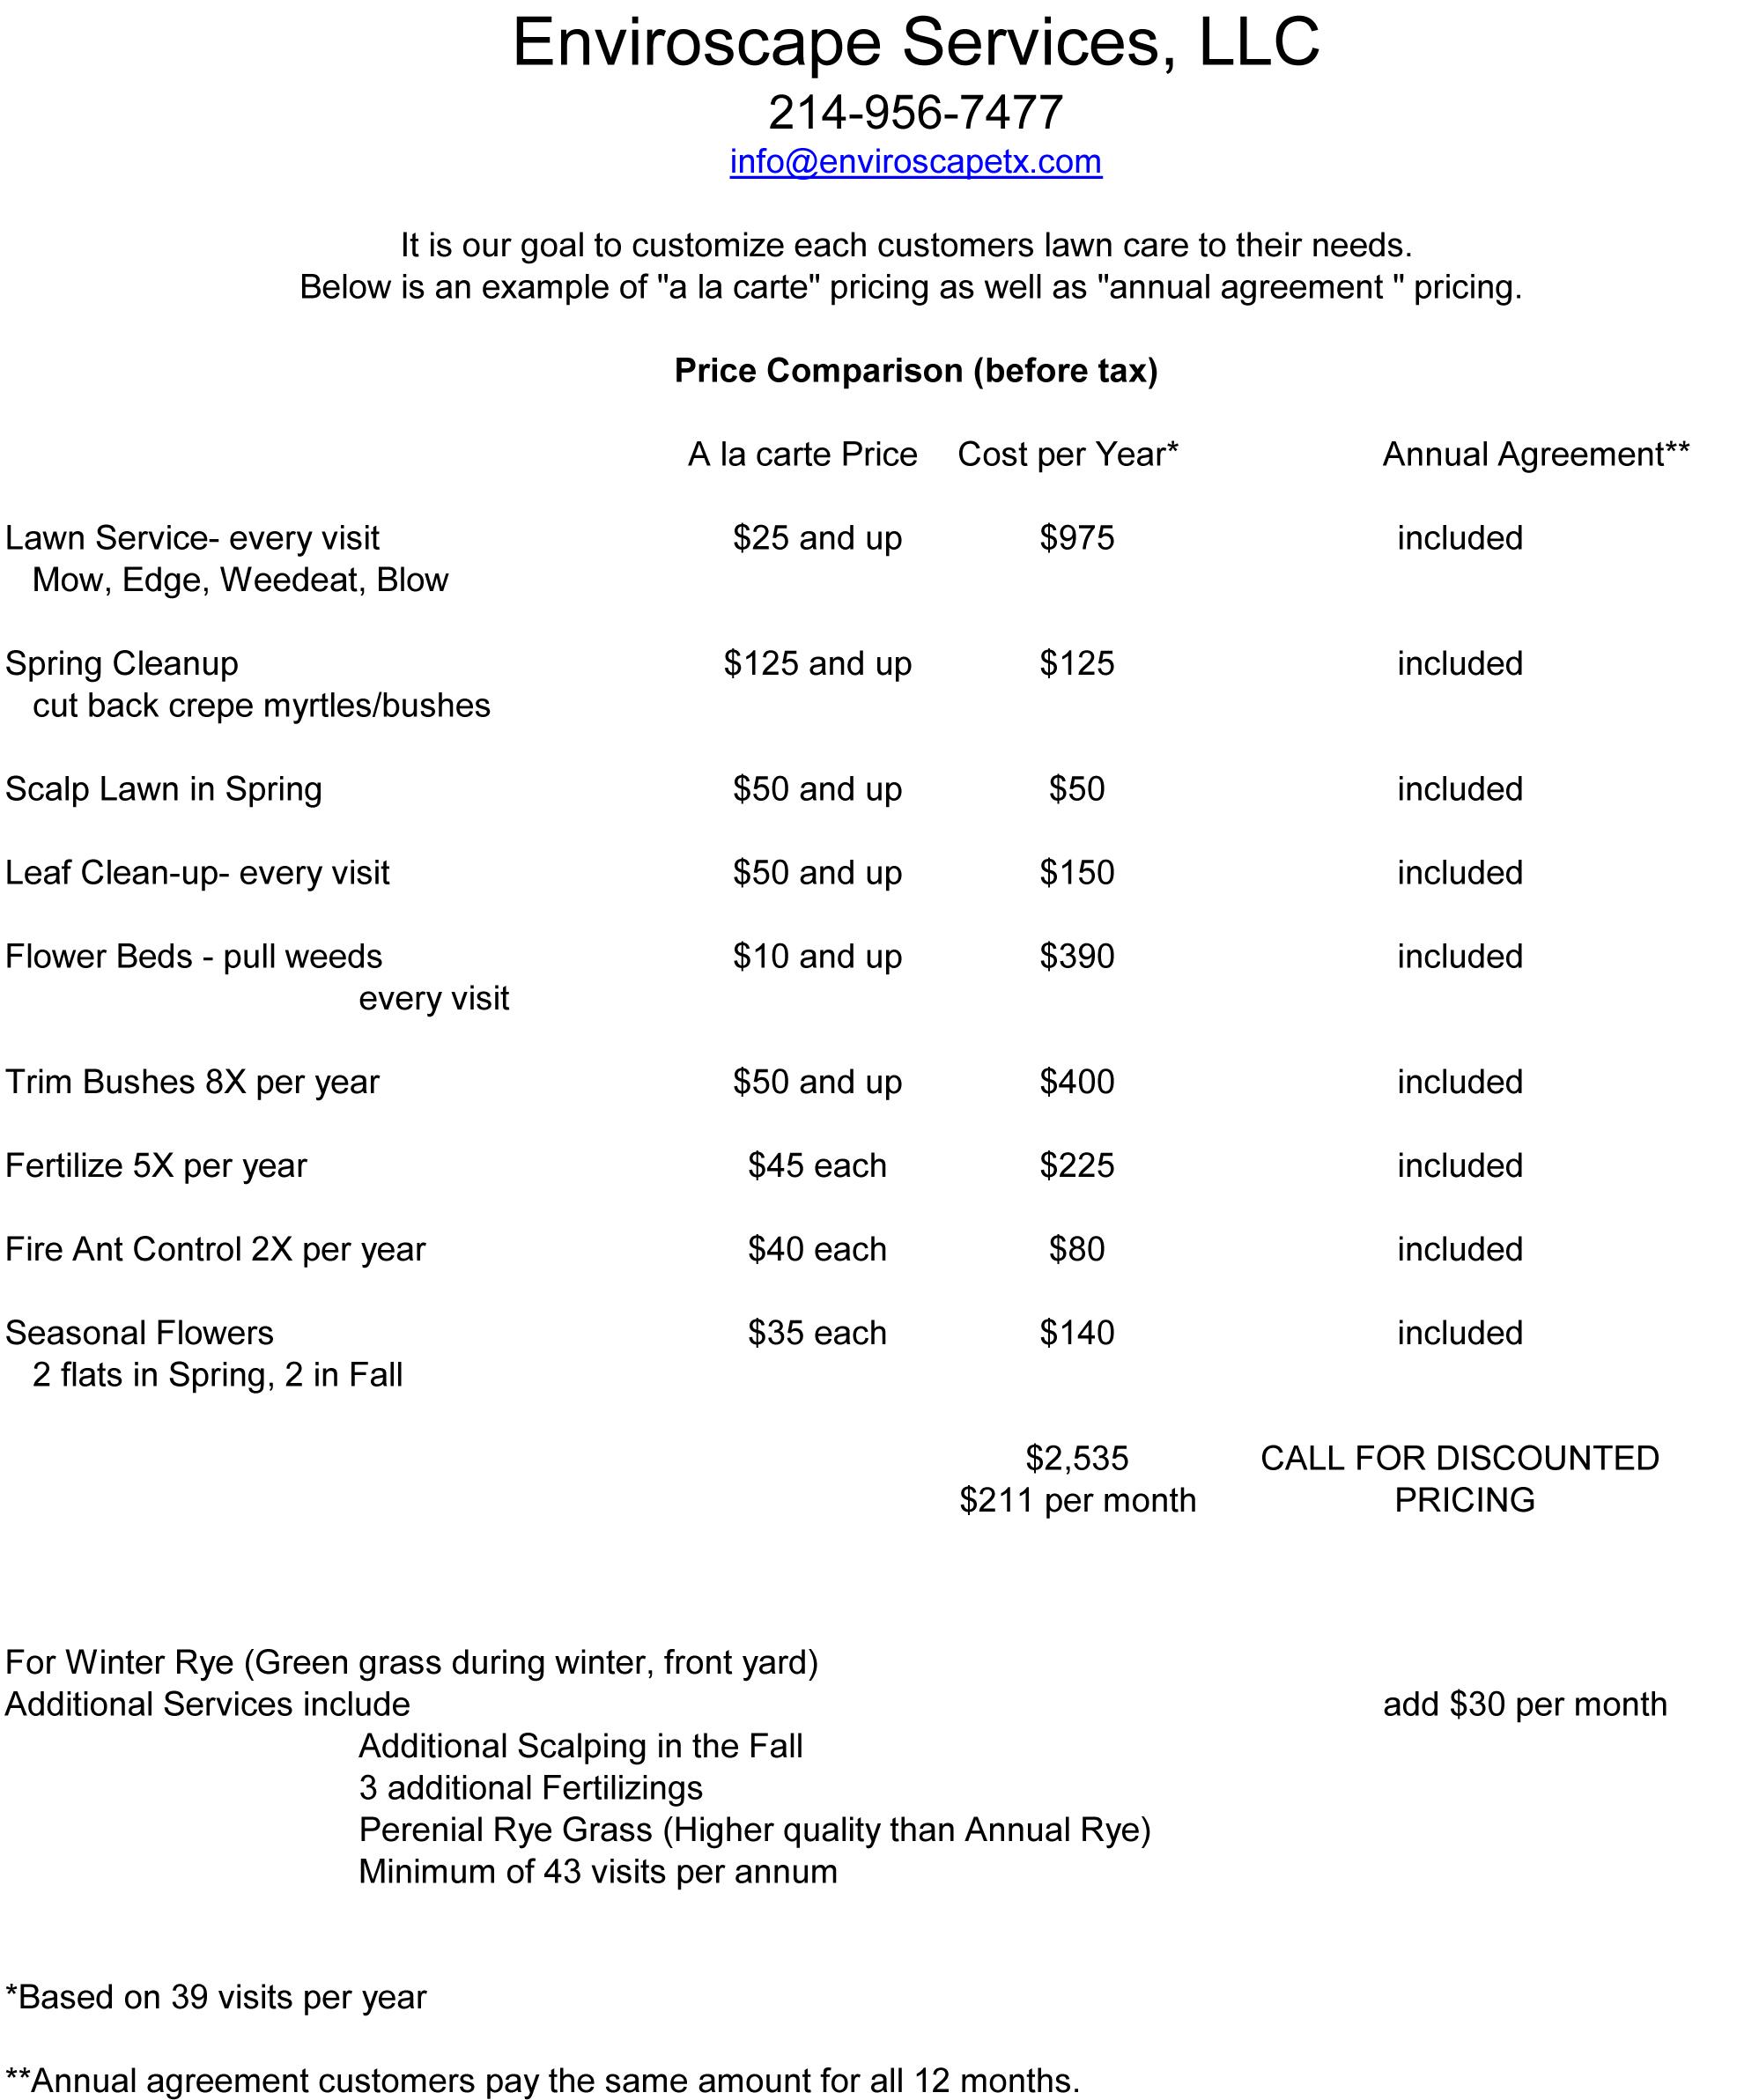 Copy of 25 Price Level WEBSITE.jpg